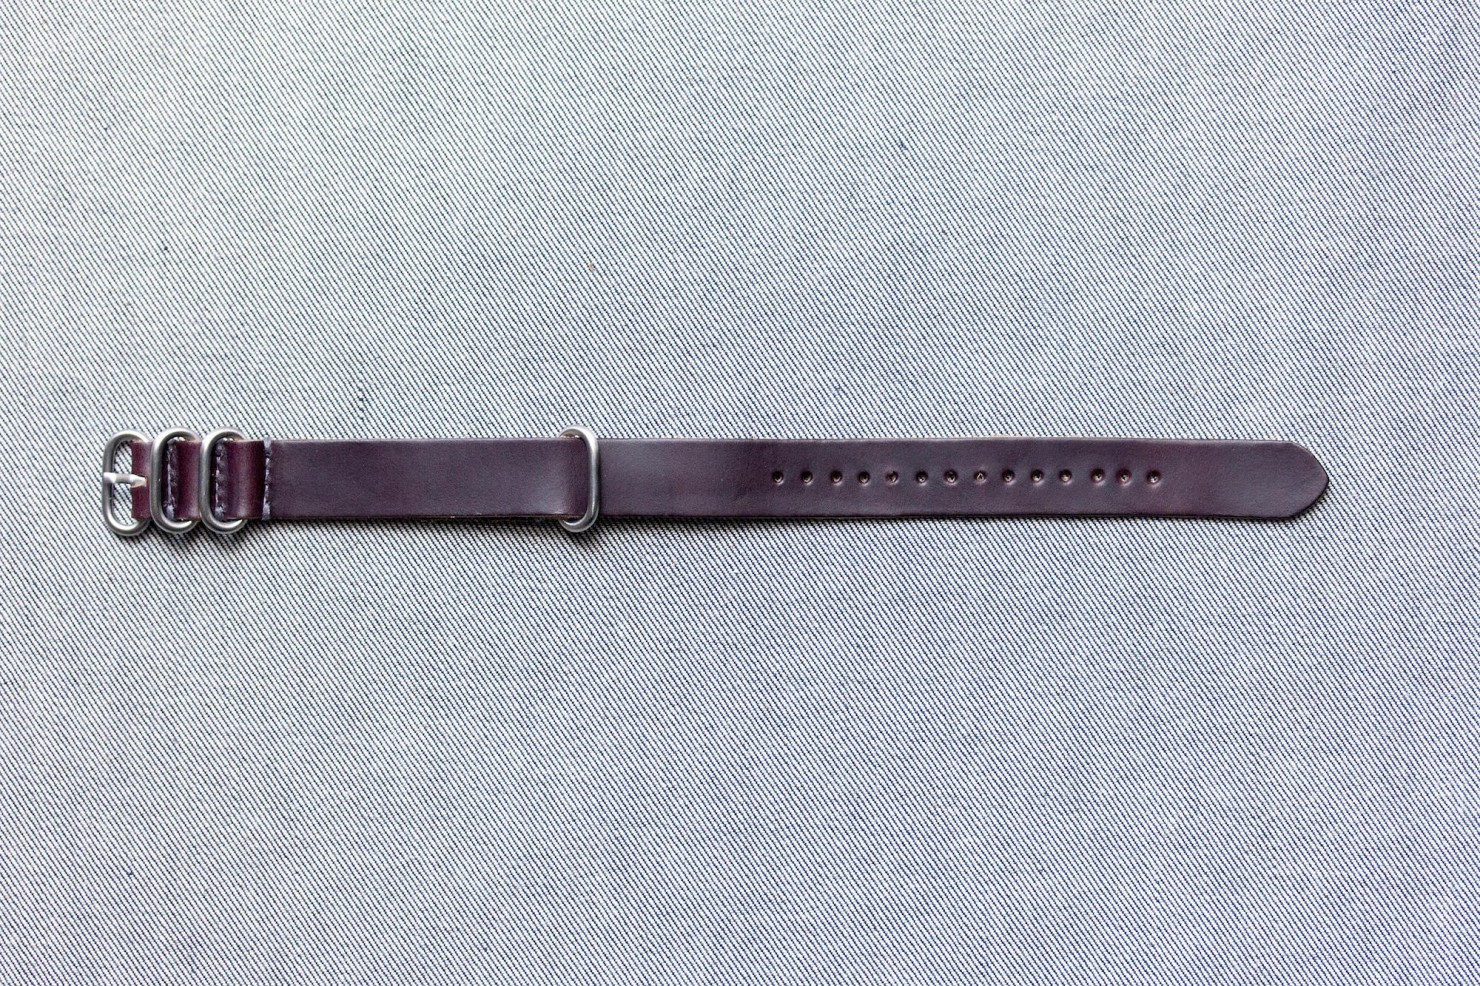 Military Watch Strap by Worn & Wound